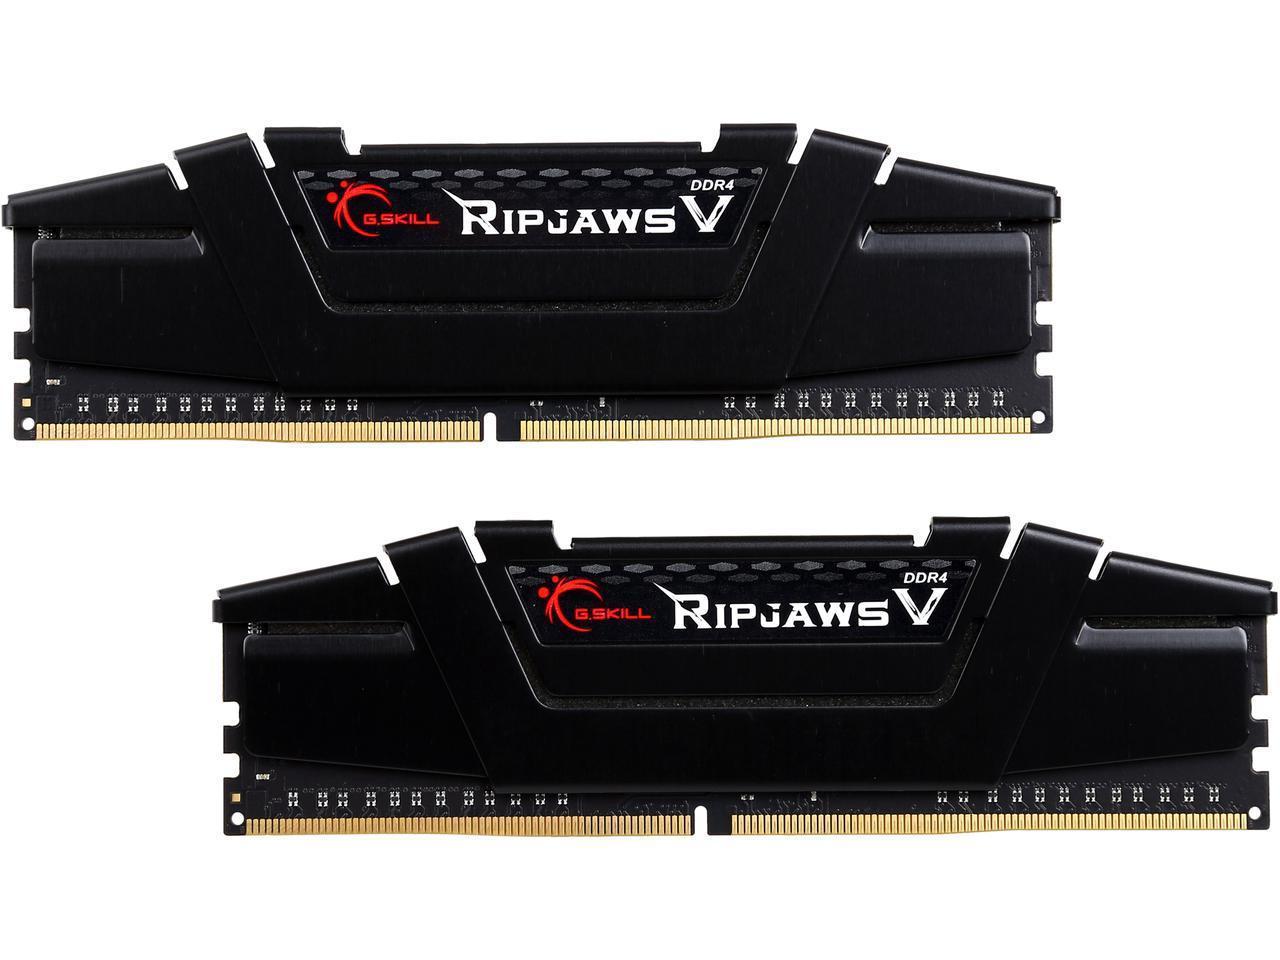 NEWEGG - G.SKILL Ripjaws V Series 16GB (2 x 8GB) 288-Pin DDR4 SDRAM DDR4 3200 (PC4 25600) Desktop Memory Model F4-3200C14D-16GVK - $125